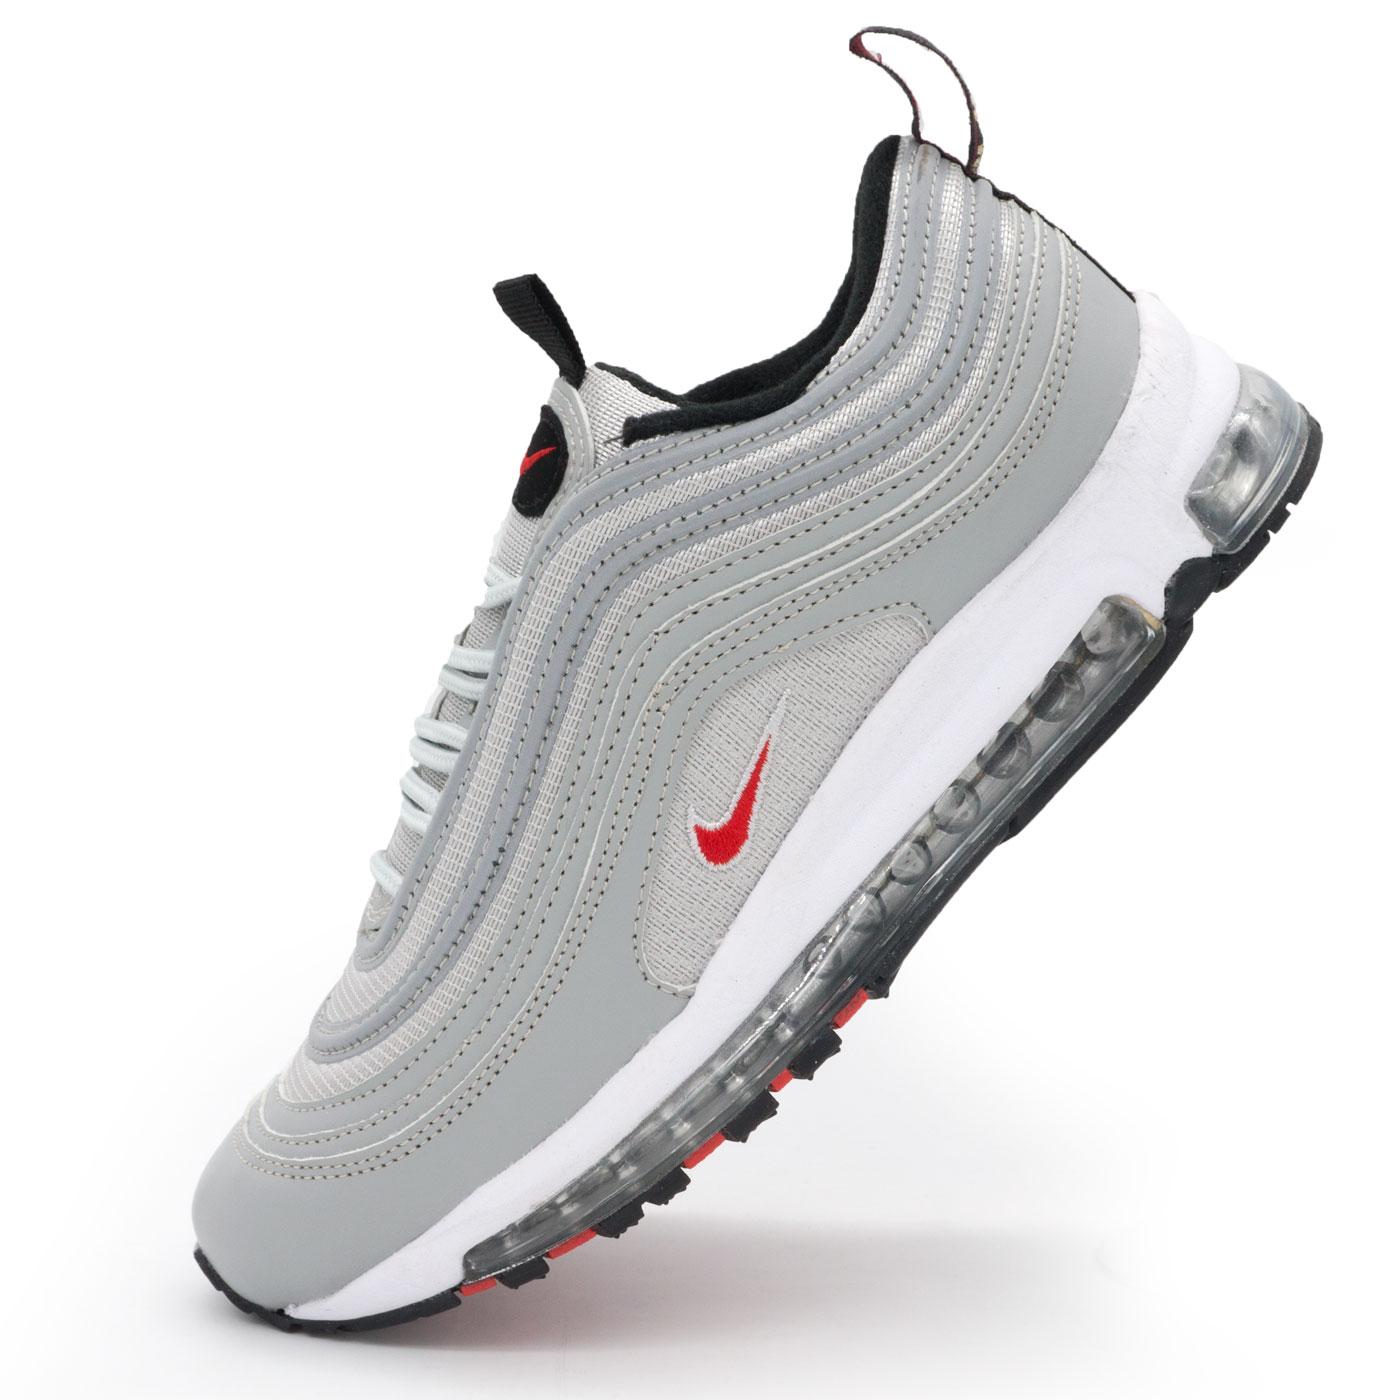 d23e8bf4 ... фото main Мужские и женские кроссовки Nike air max 97 серебристые  Vietnam main ...